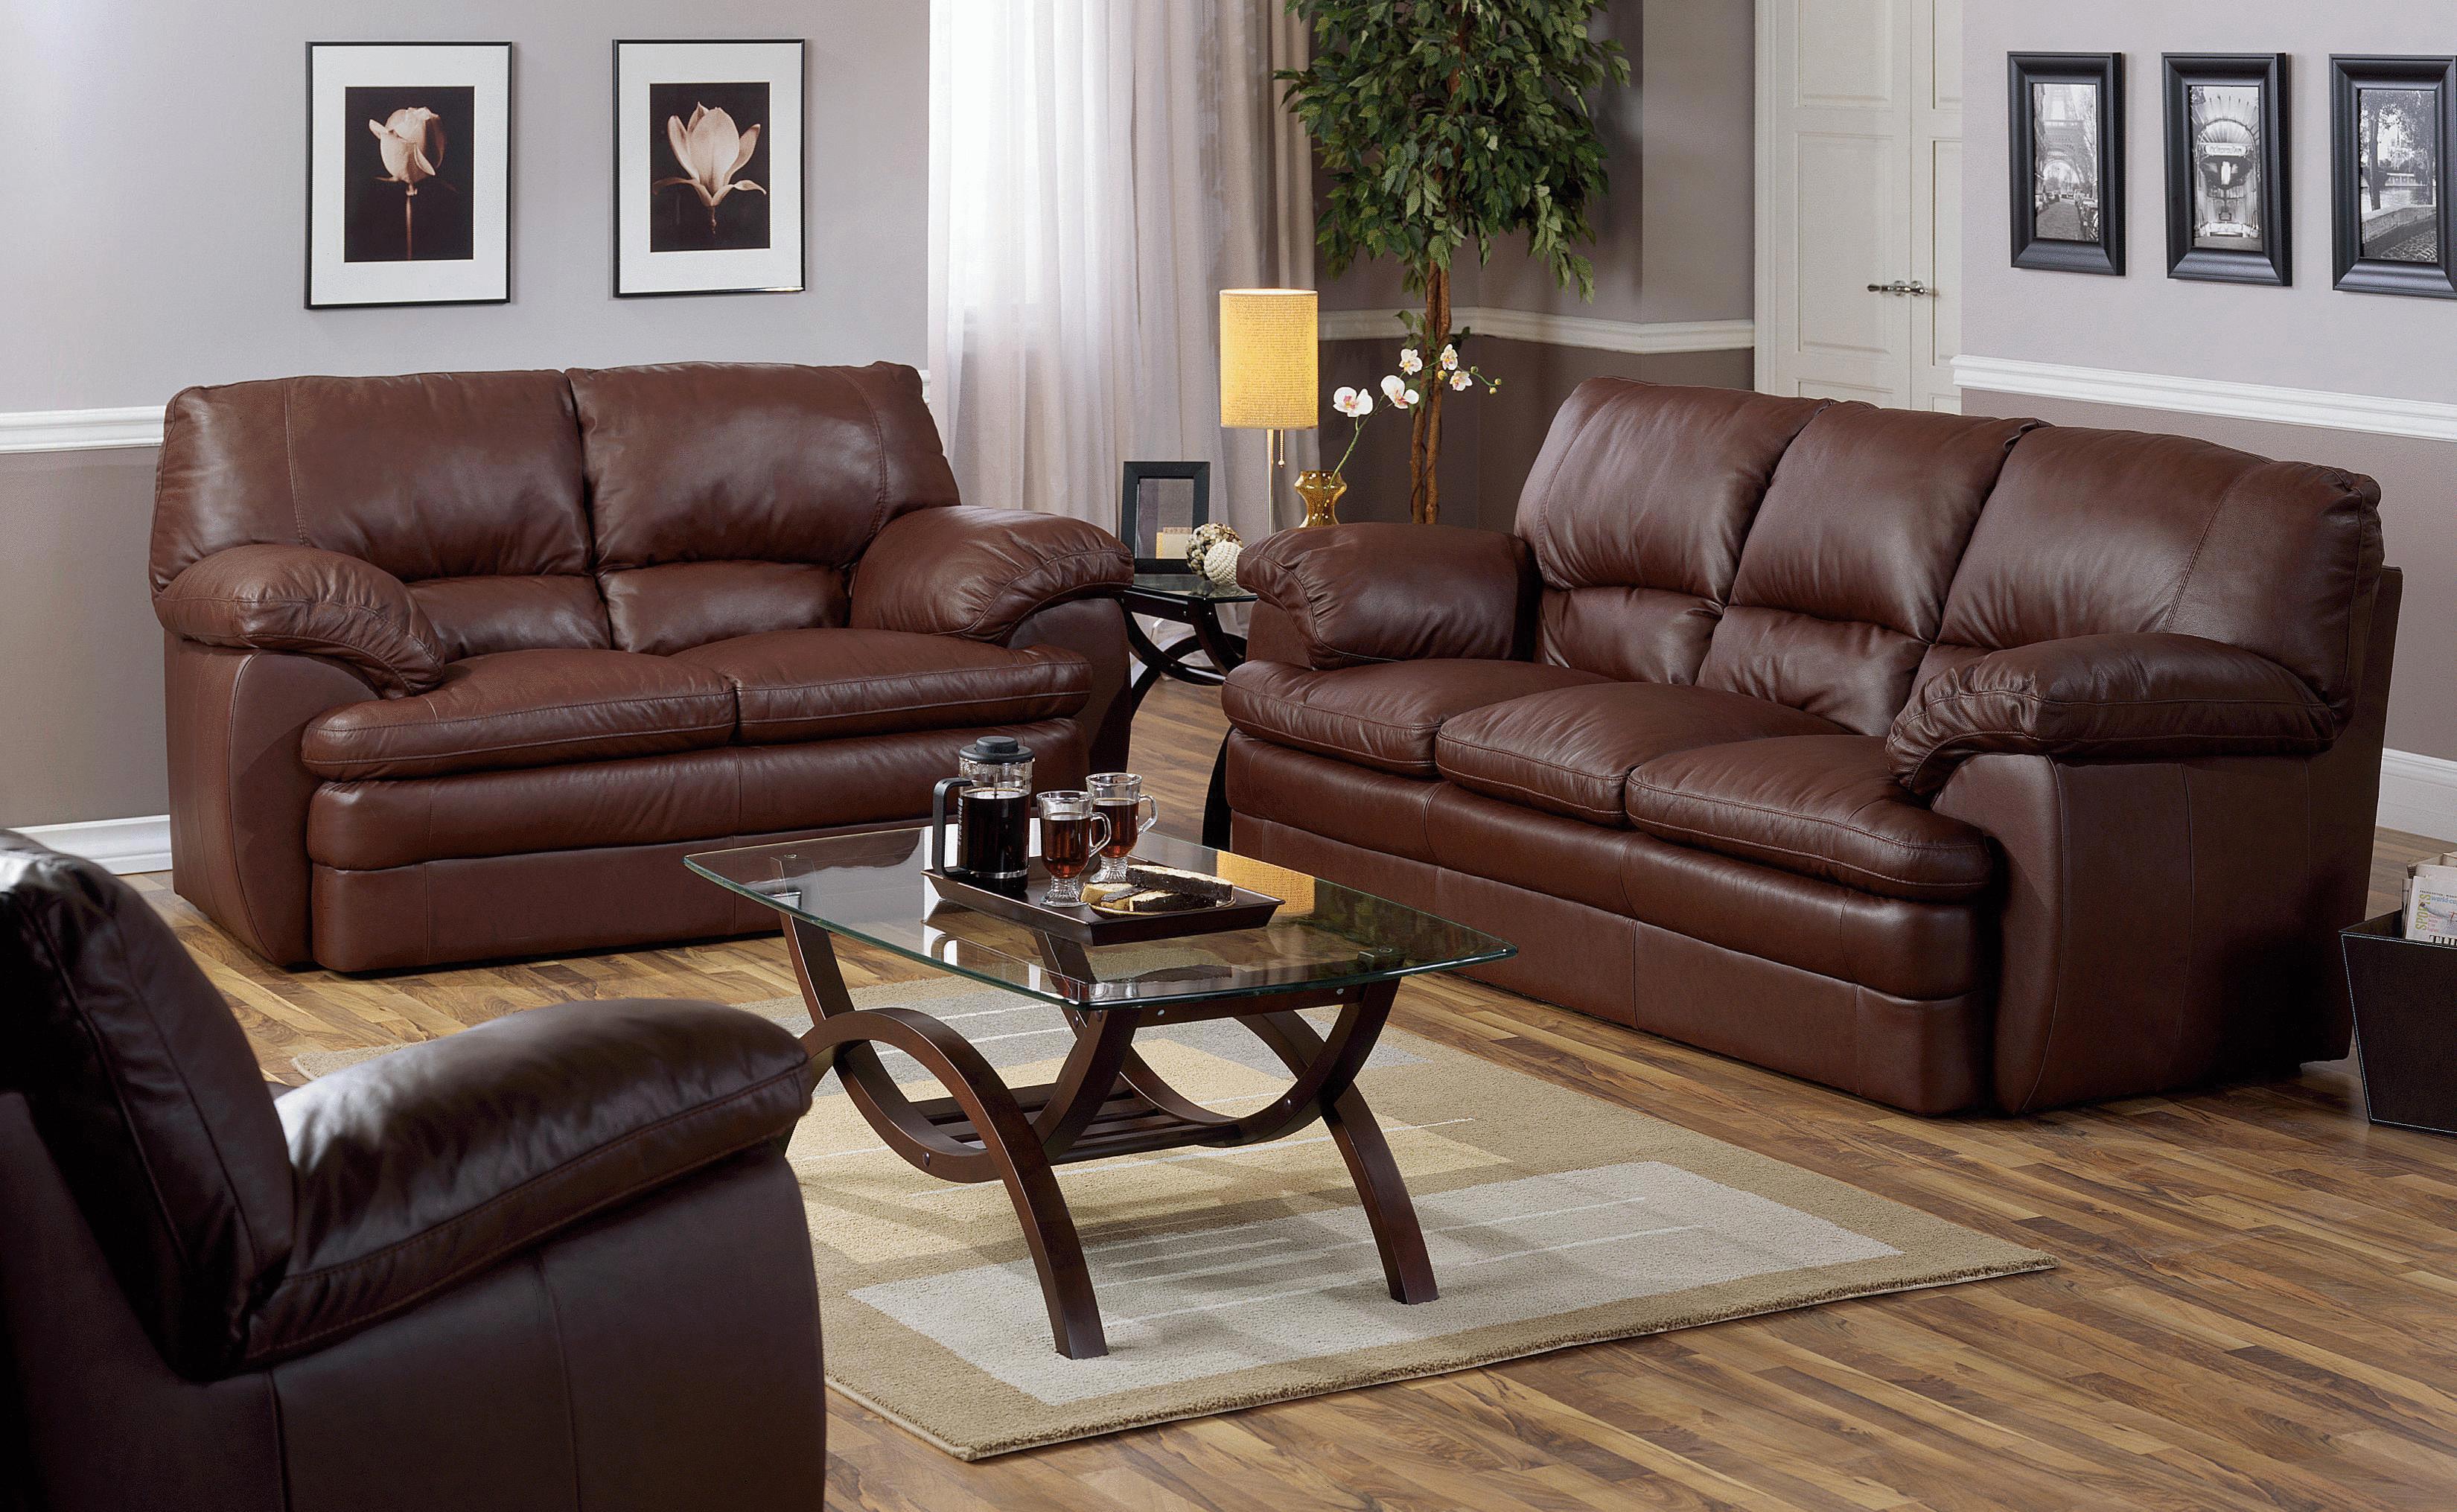 palliser stationary sofas sofa covers edinburgh marcella pillow top conlin 39s furniture